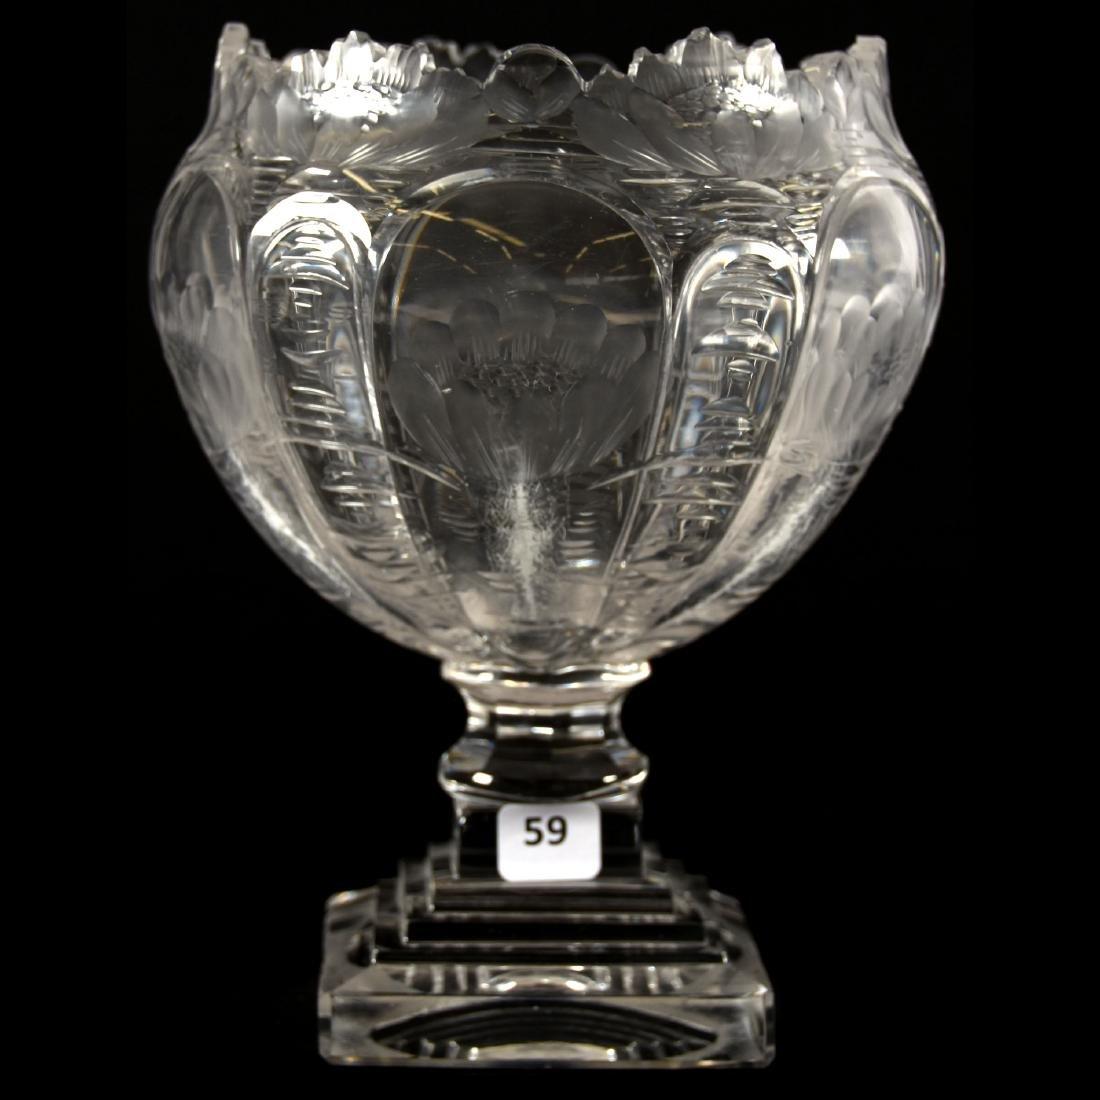 Pedestal Rose Bowl, Engraved Waterlily Design